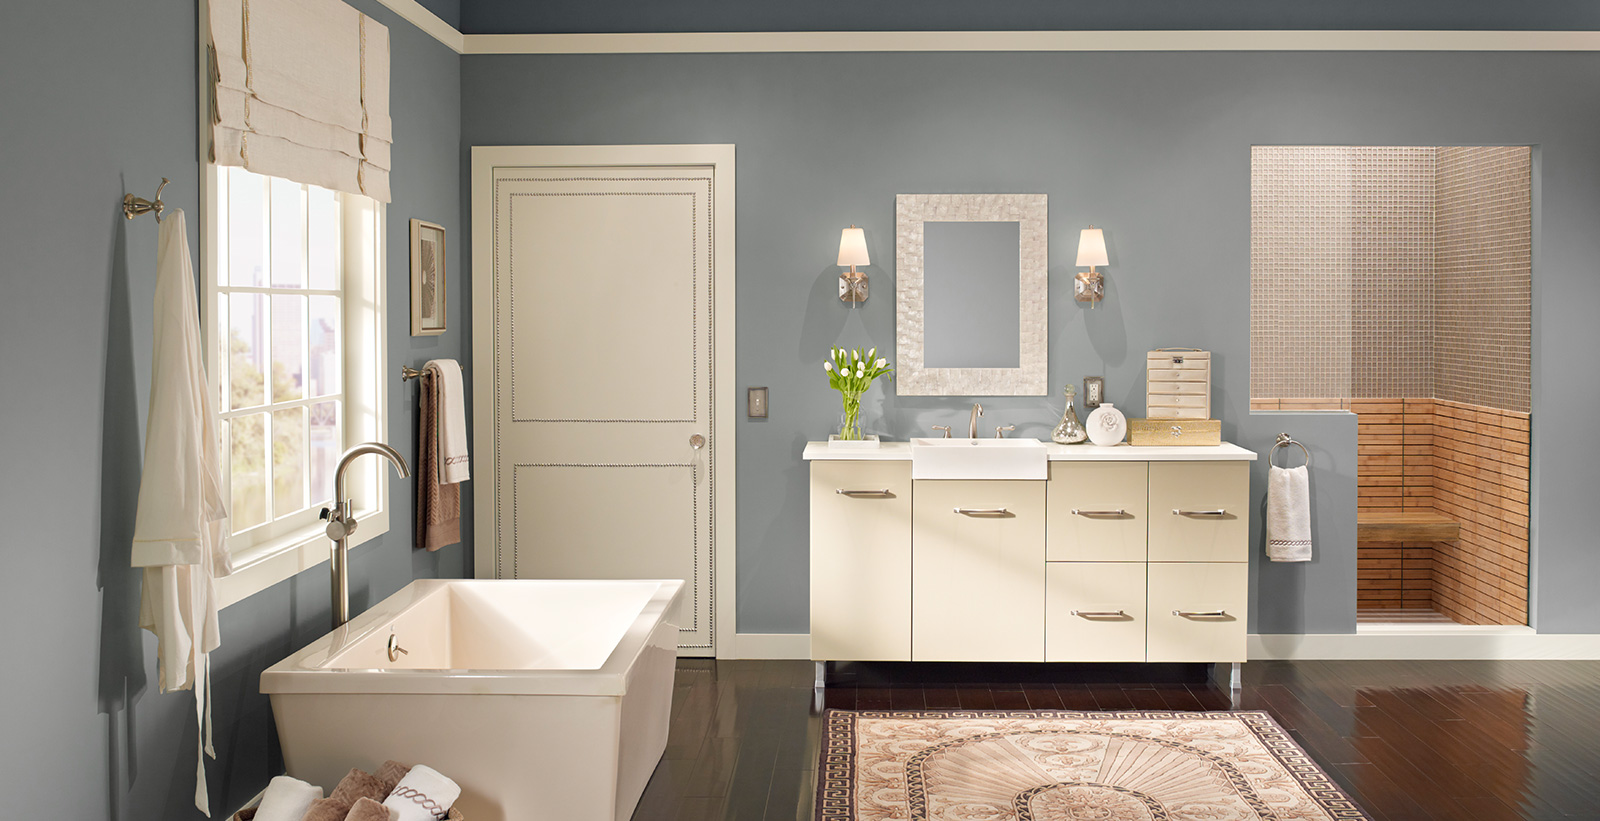 Calming Bathroom Ideas and Inspirational Paint Colors | Behr on Popular Bathroom Ideas  id=70320